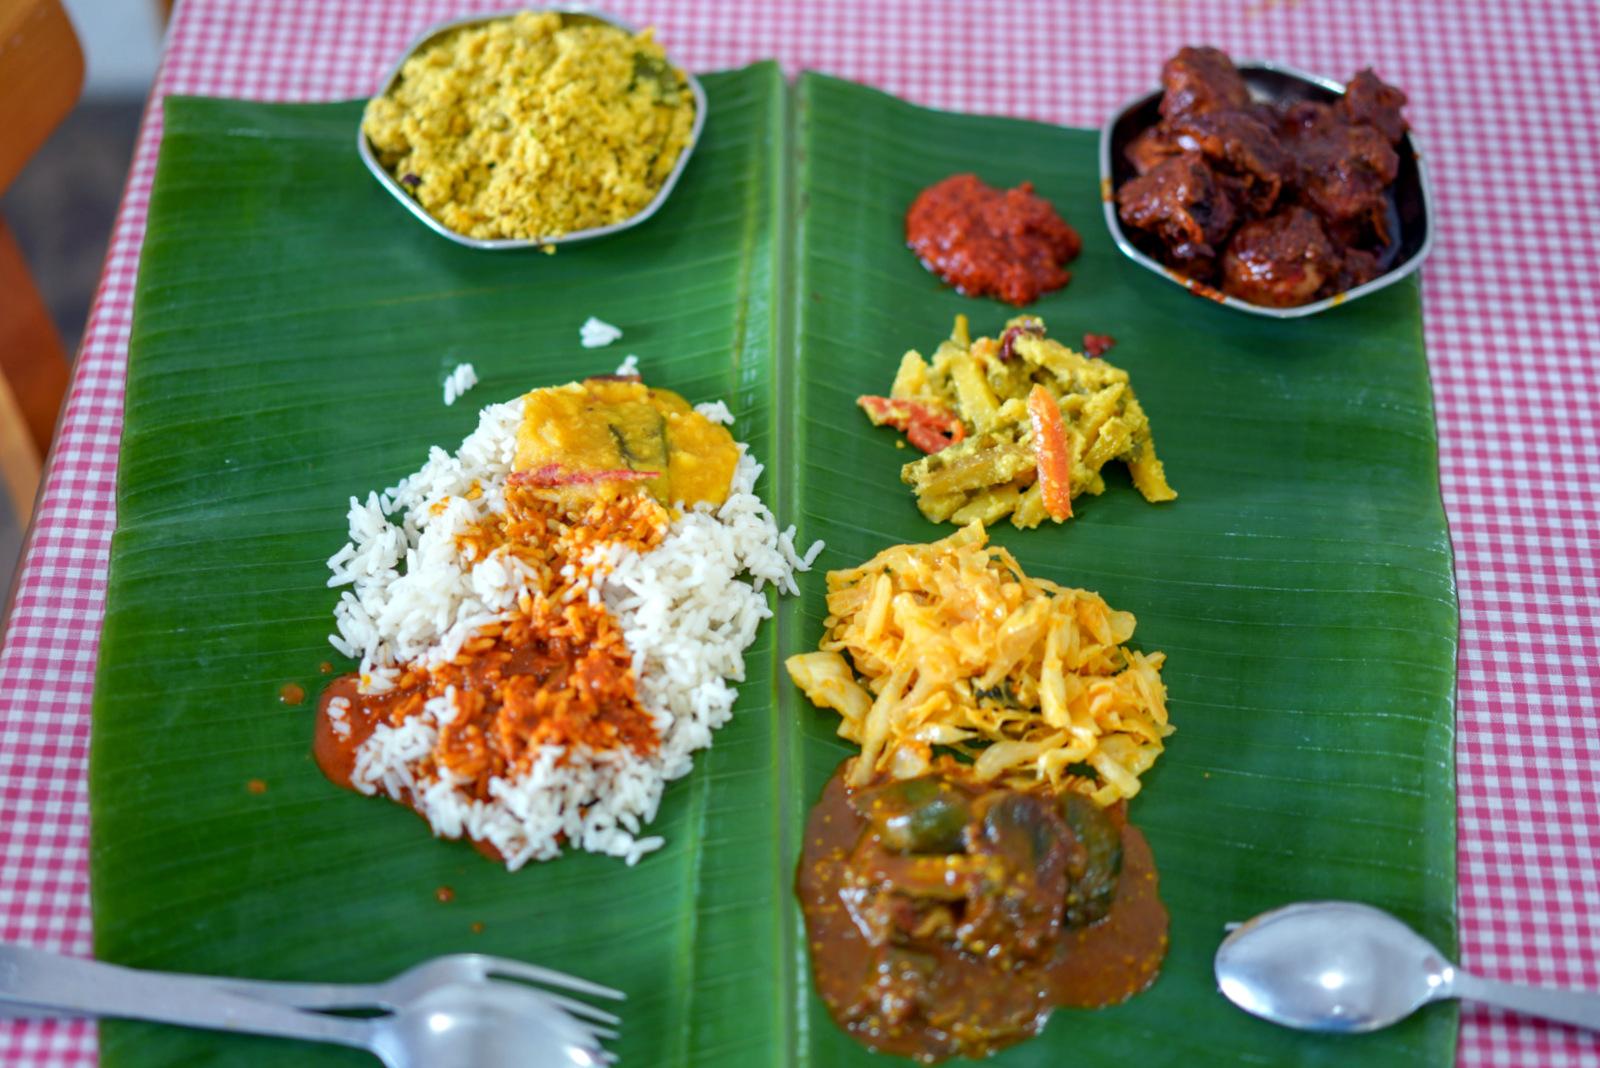 Shobana's Kerala Kitchen, Petaling Jaya